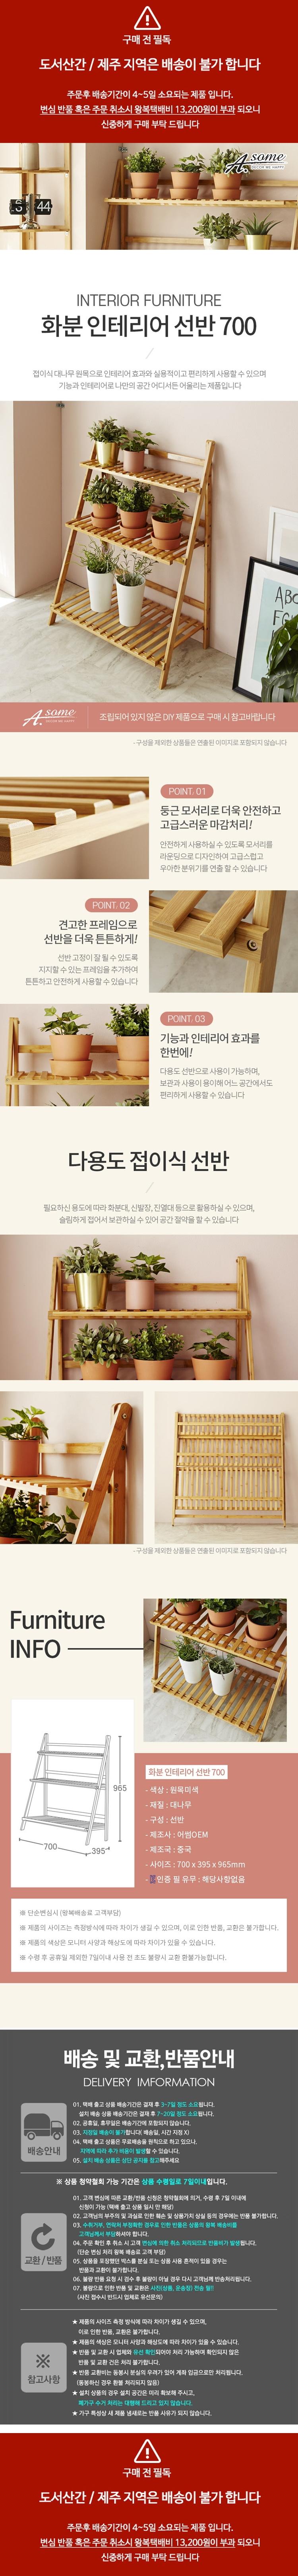 54_wood_flowerpot_700_web.jpg